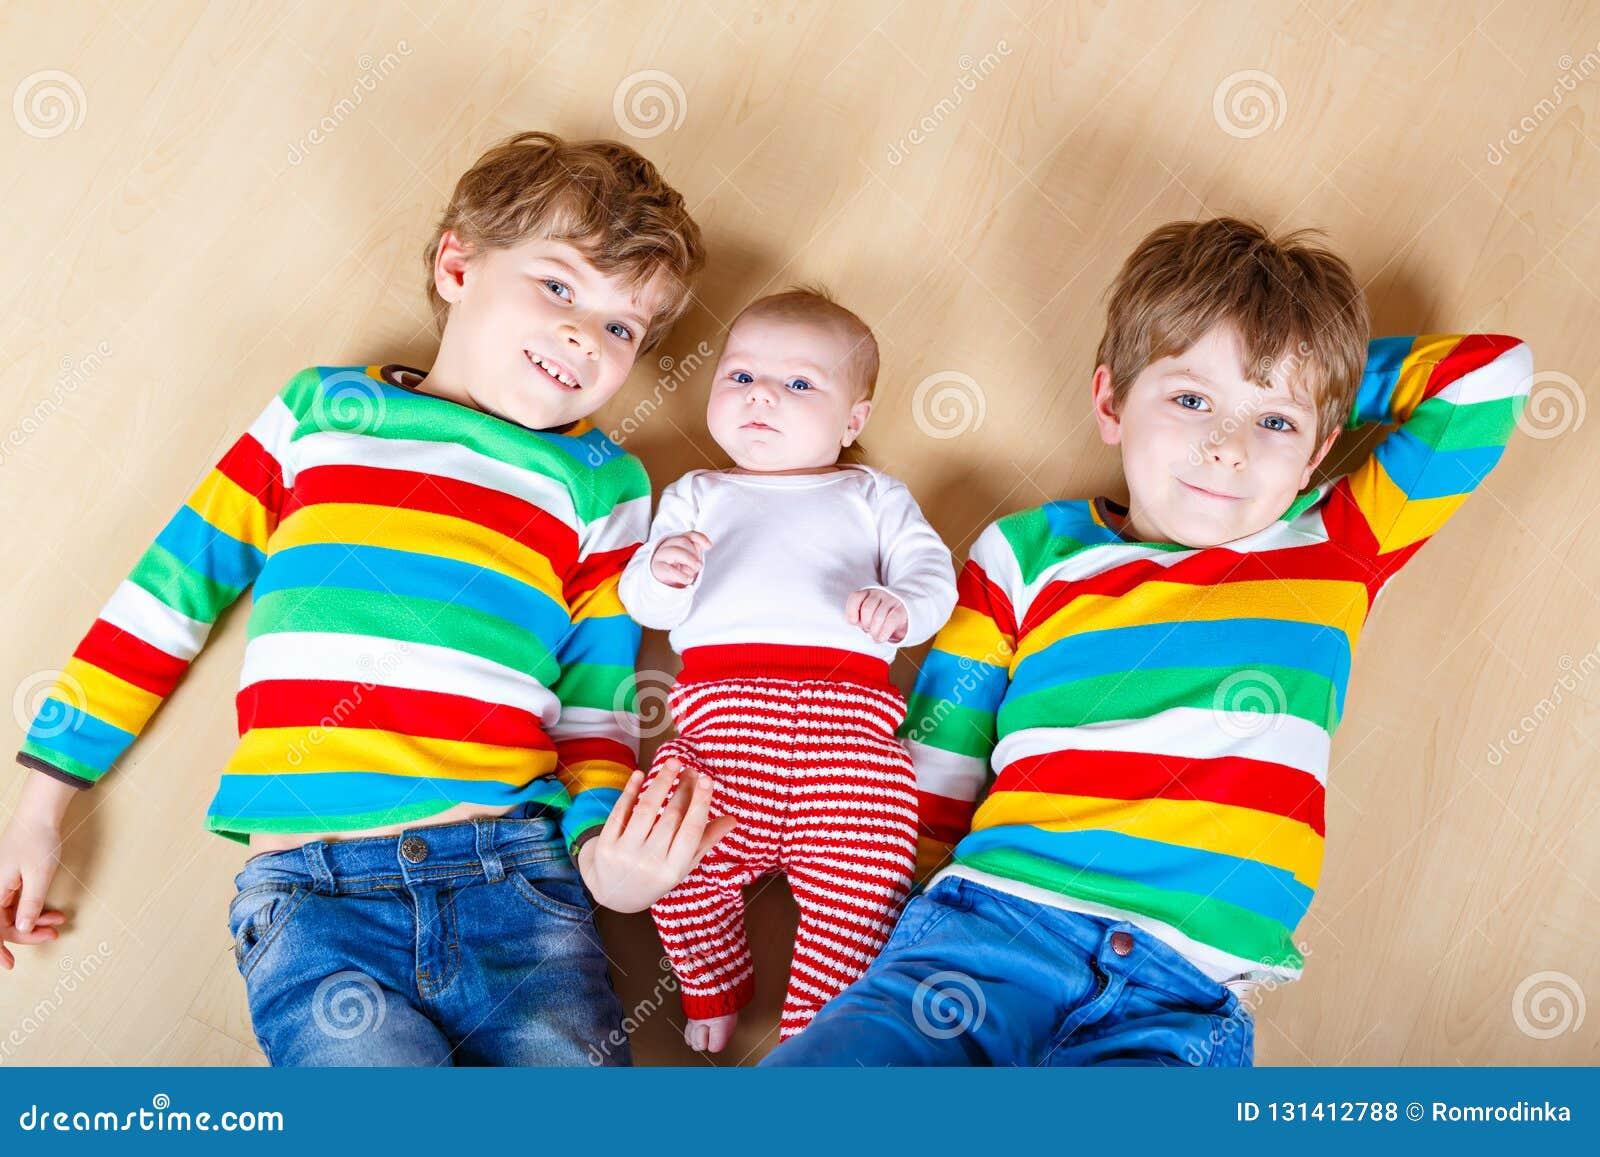 5e0c7a80a Two Happy Little Preschool Kids Boys With Newborn Baby Girl